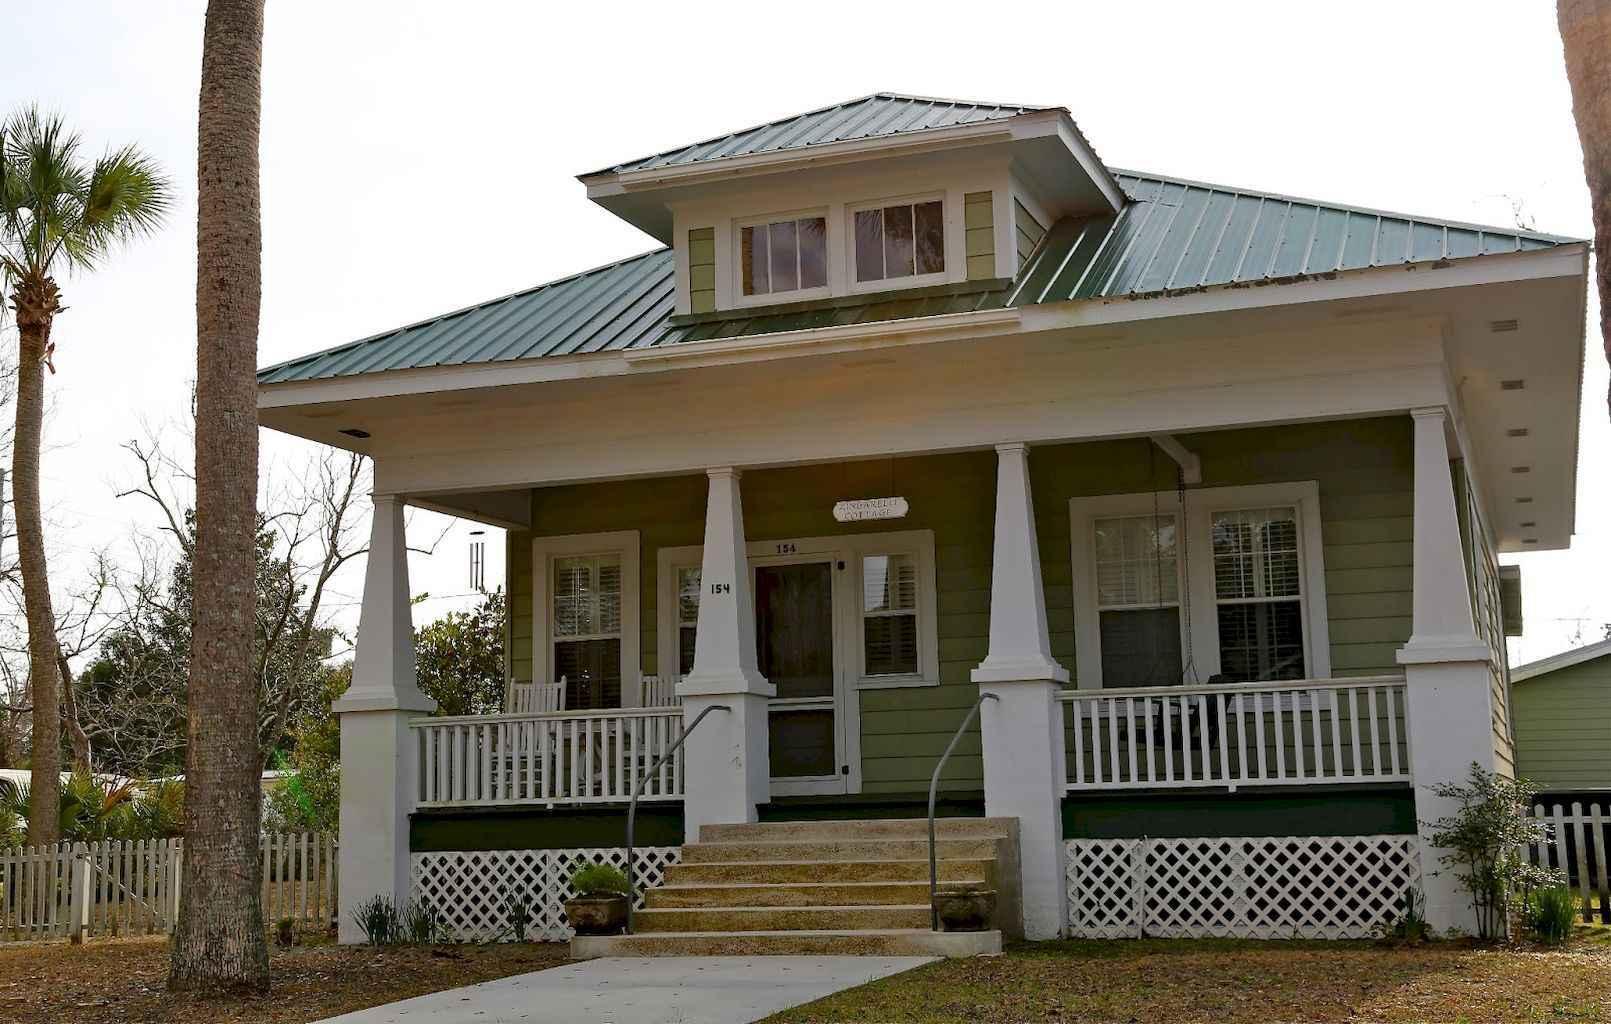 60 amazing farmhouse plans cracker style design ideas (25)